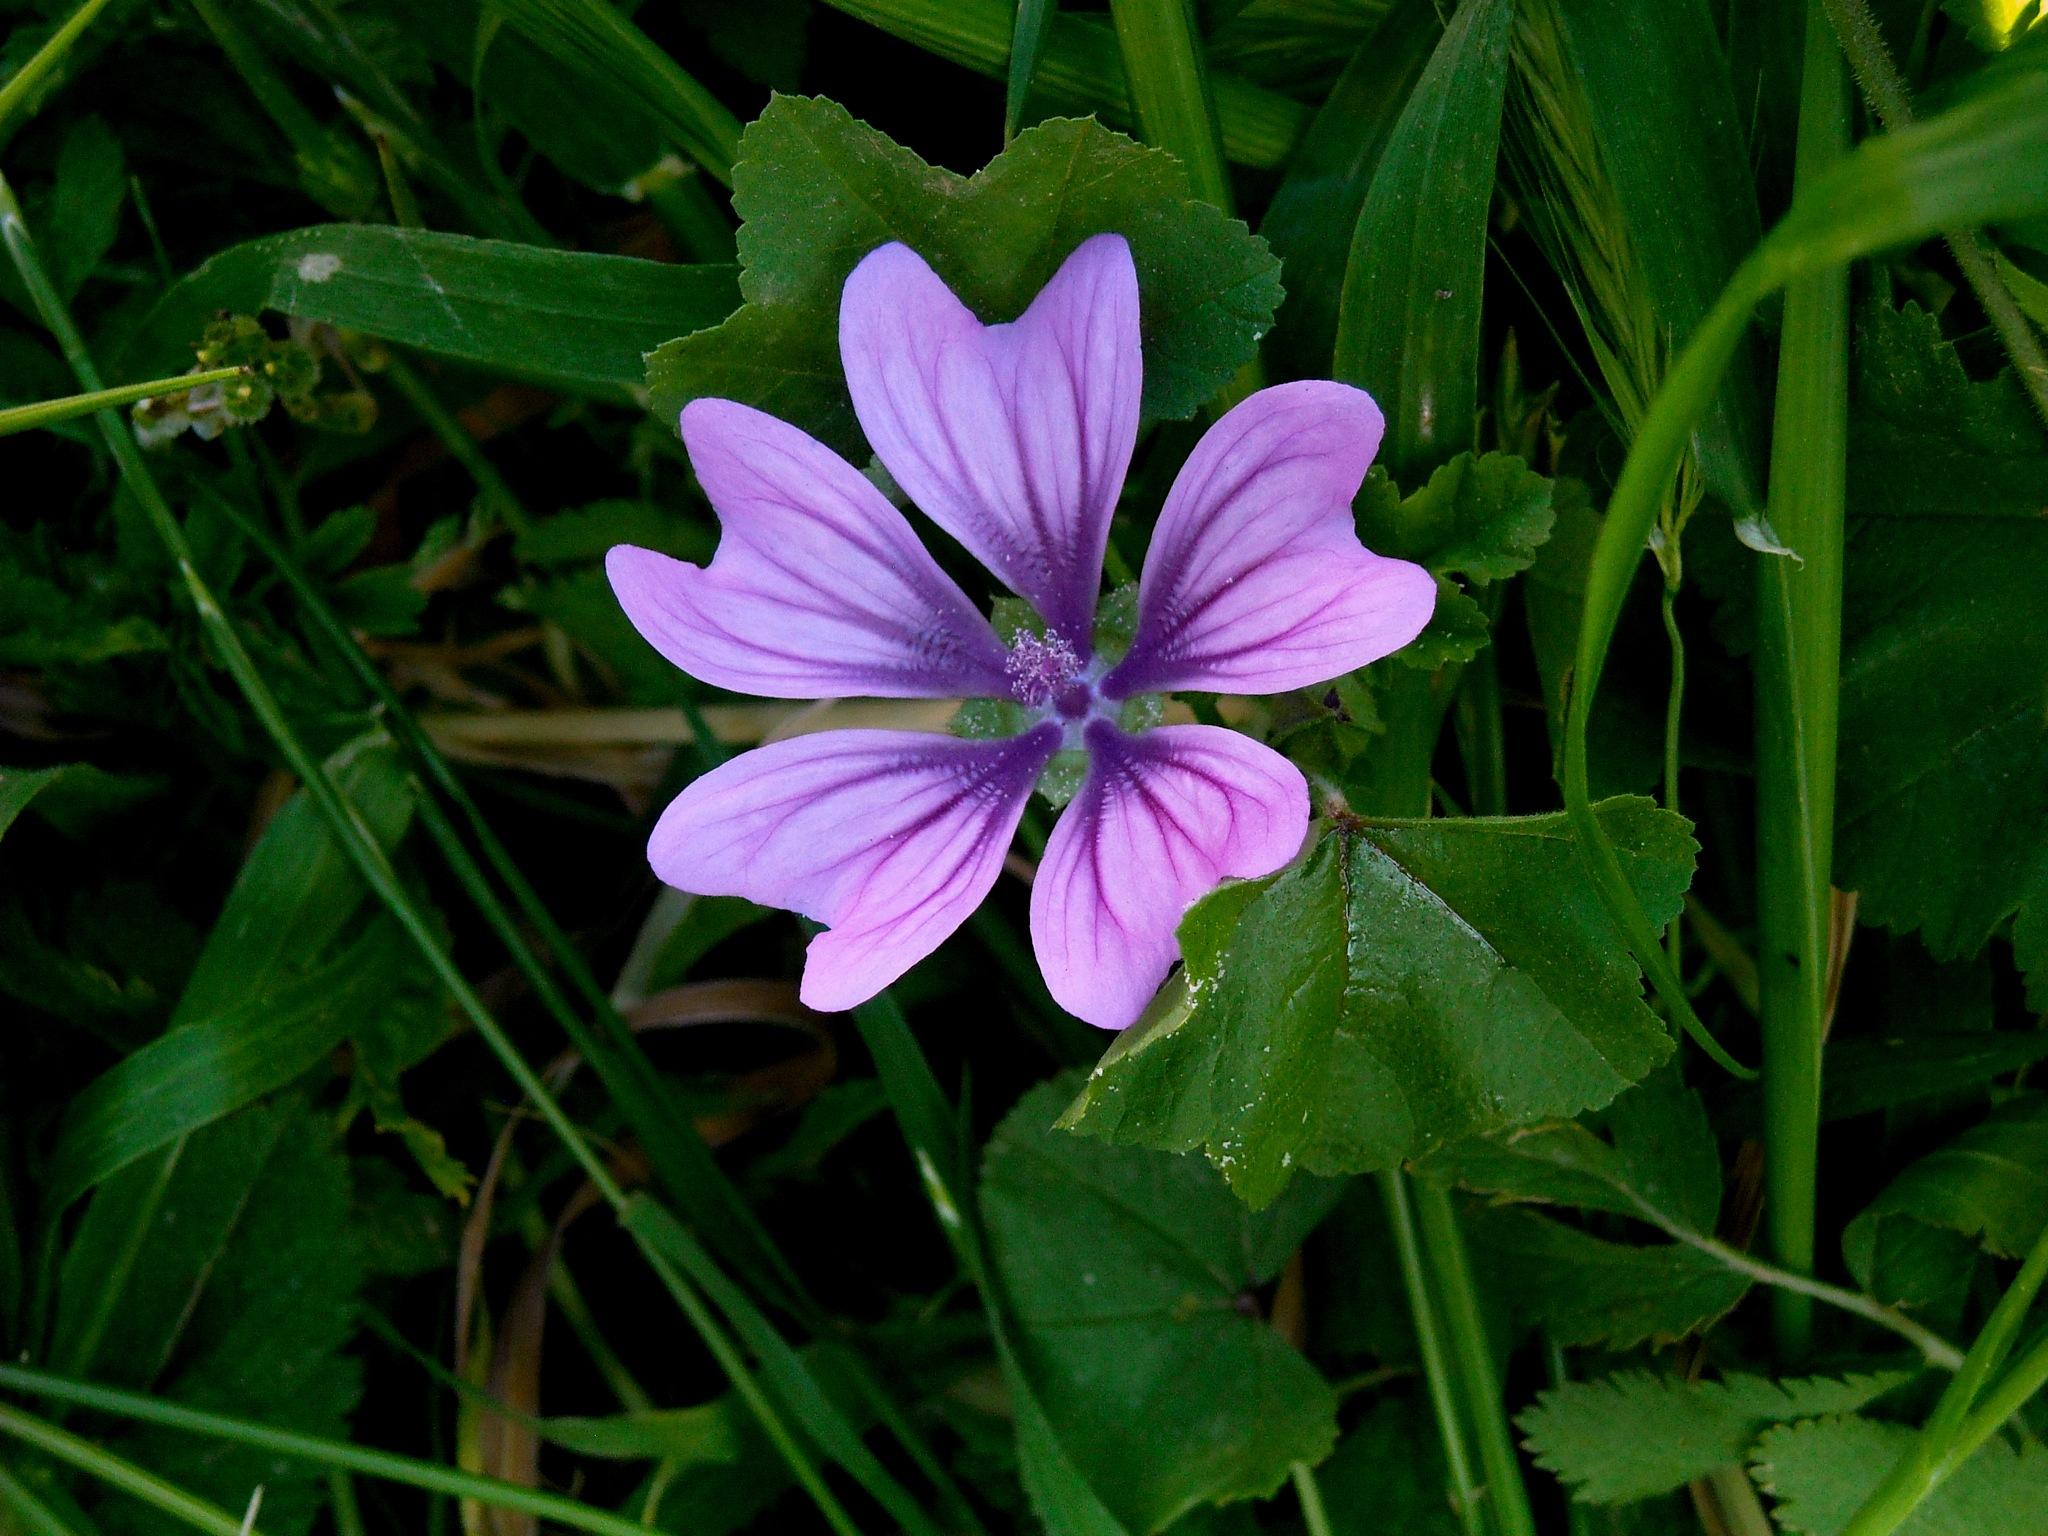 HIBISCUS  FLOWER, CLOSE UP by Akin Saner